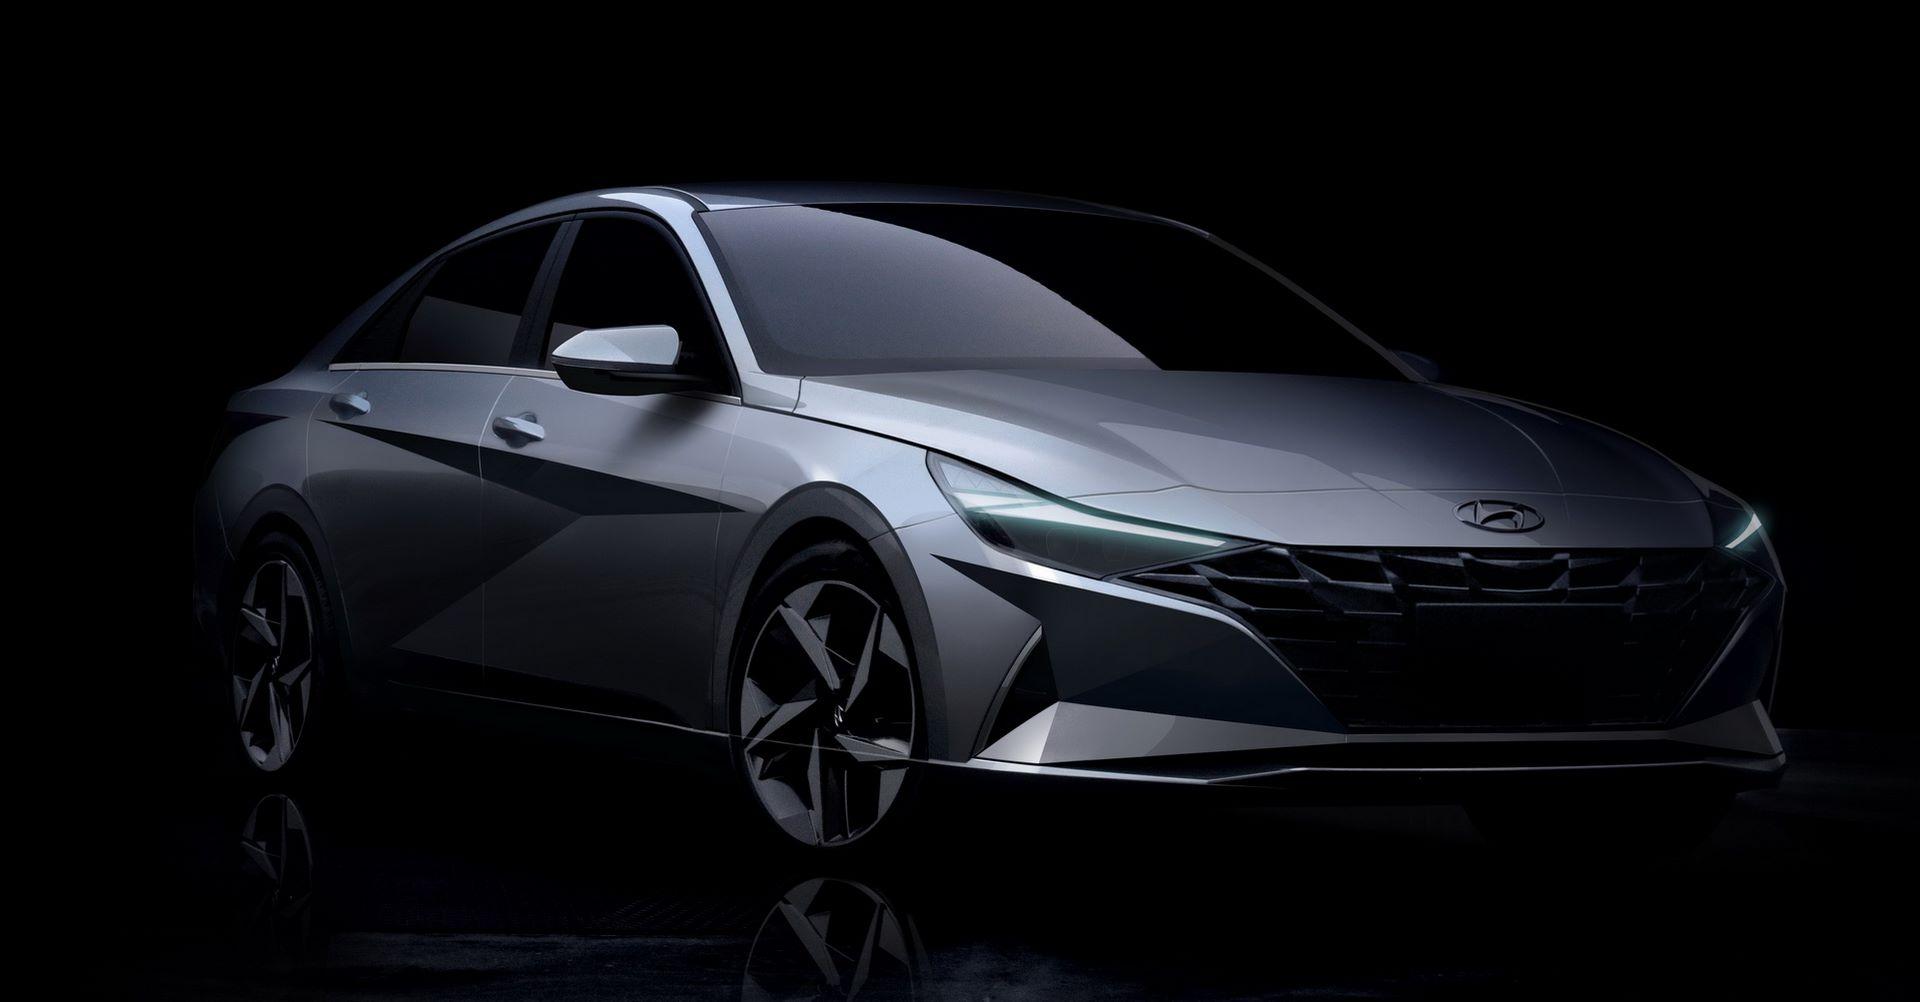 Hyundai-Elantra-2021-12